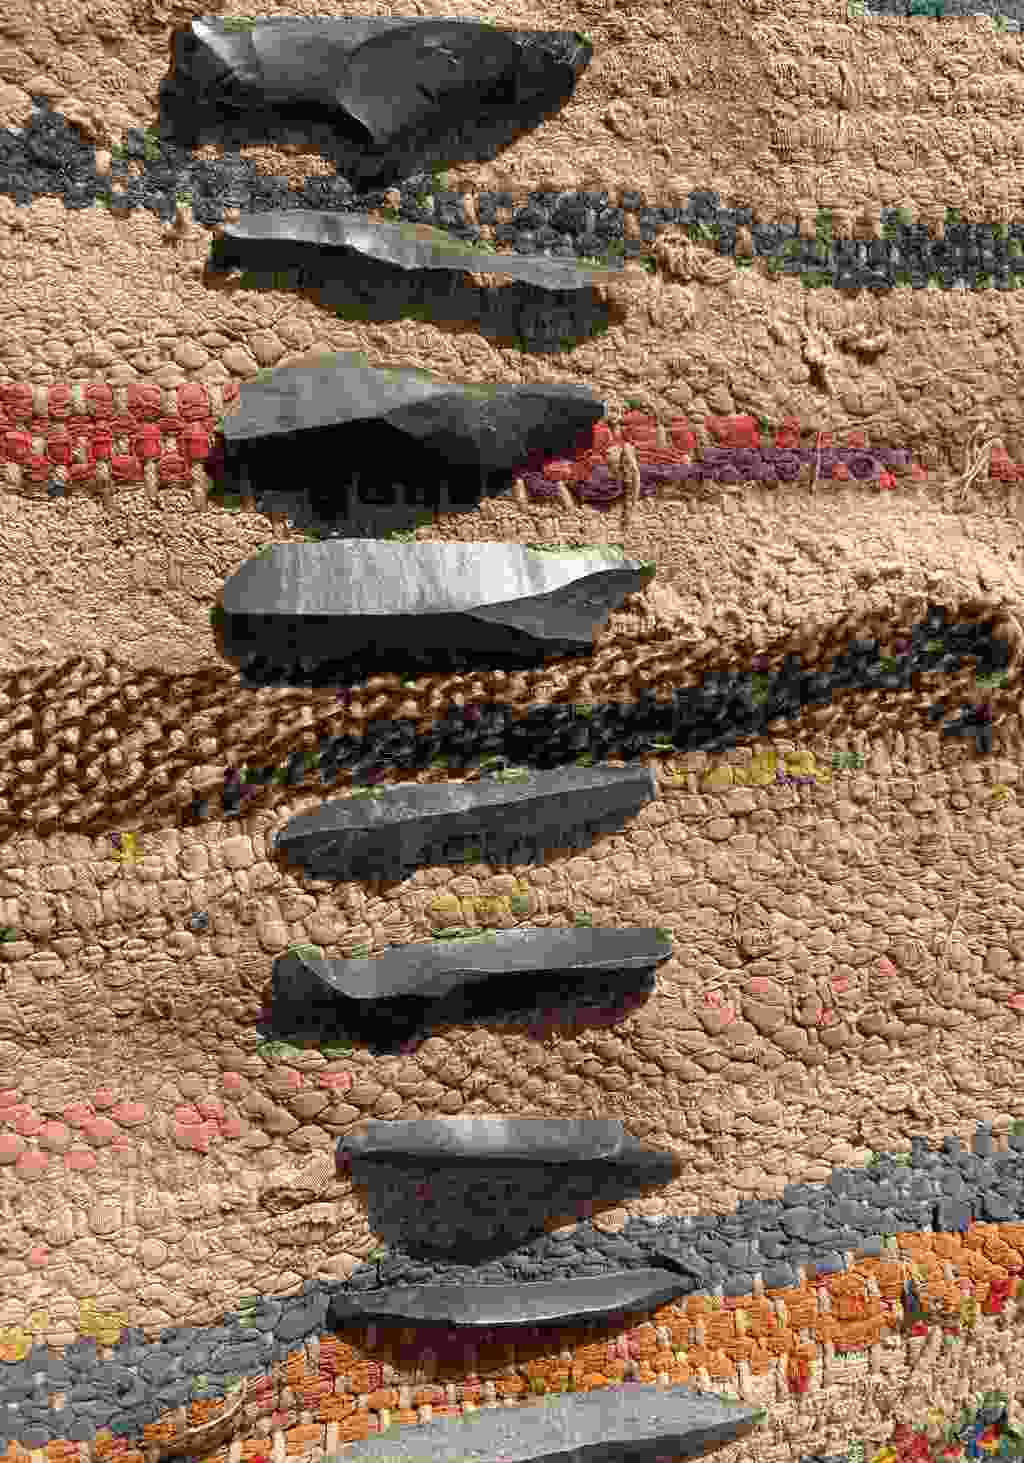 Stone Age tools (Alice Morrison)